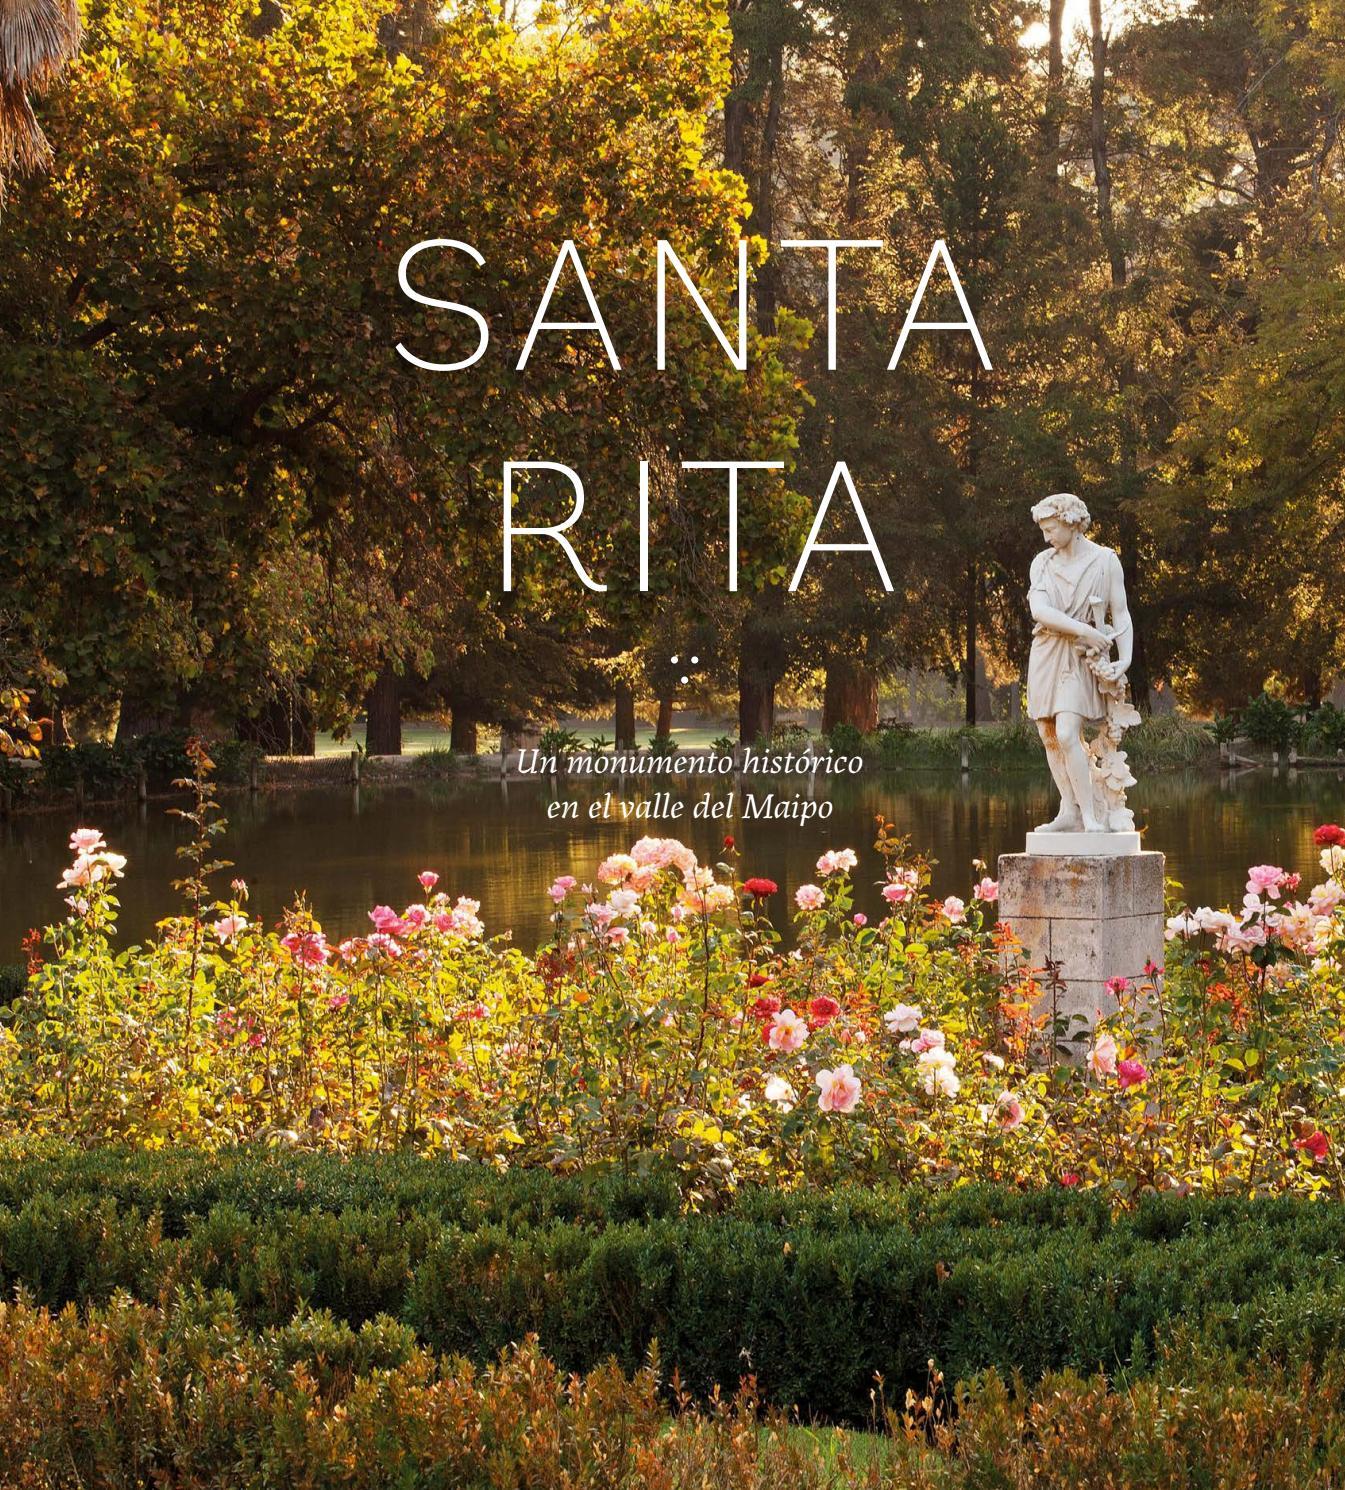 santa rita gay singles Find men seeking men in santa fe online datehookup is a 100% free dating site to meet gay men in santa fe, new mexico.